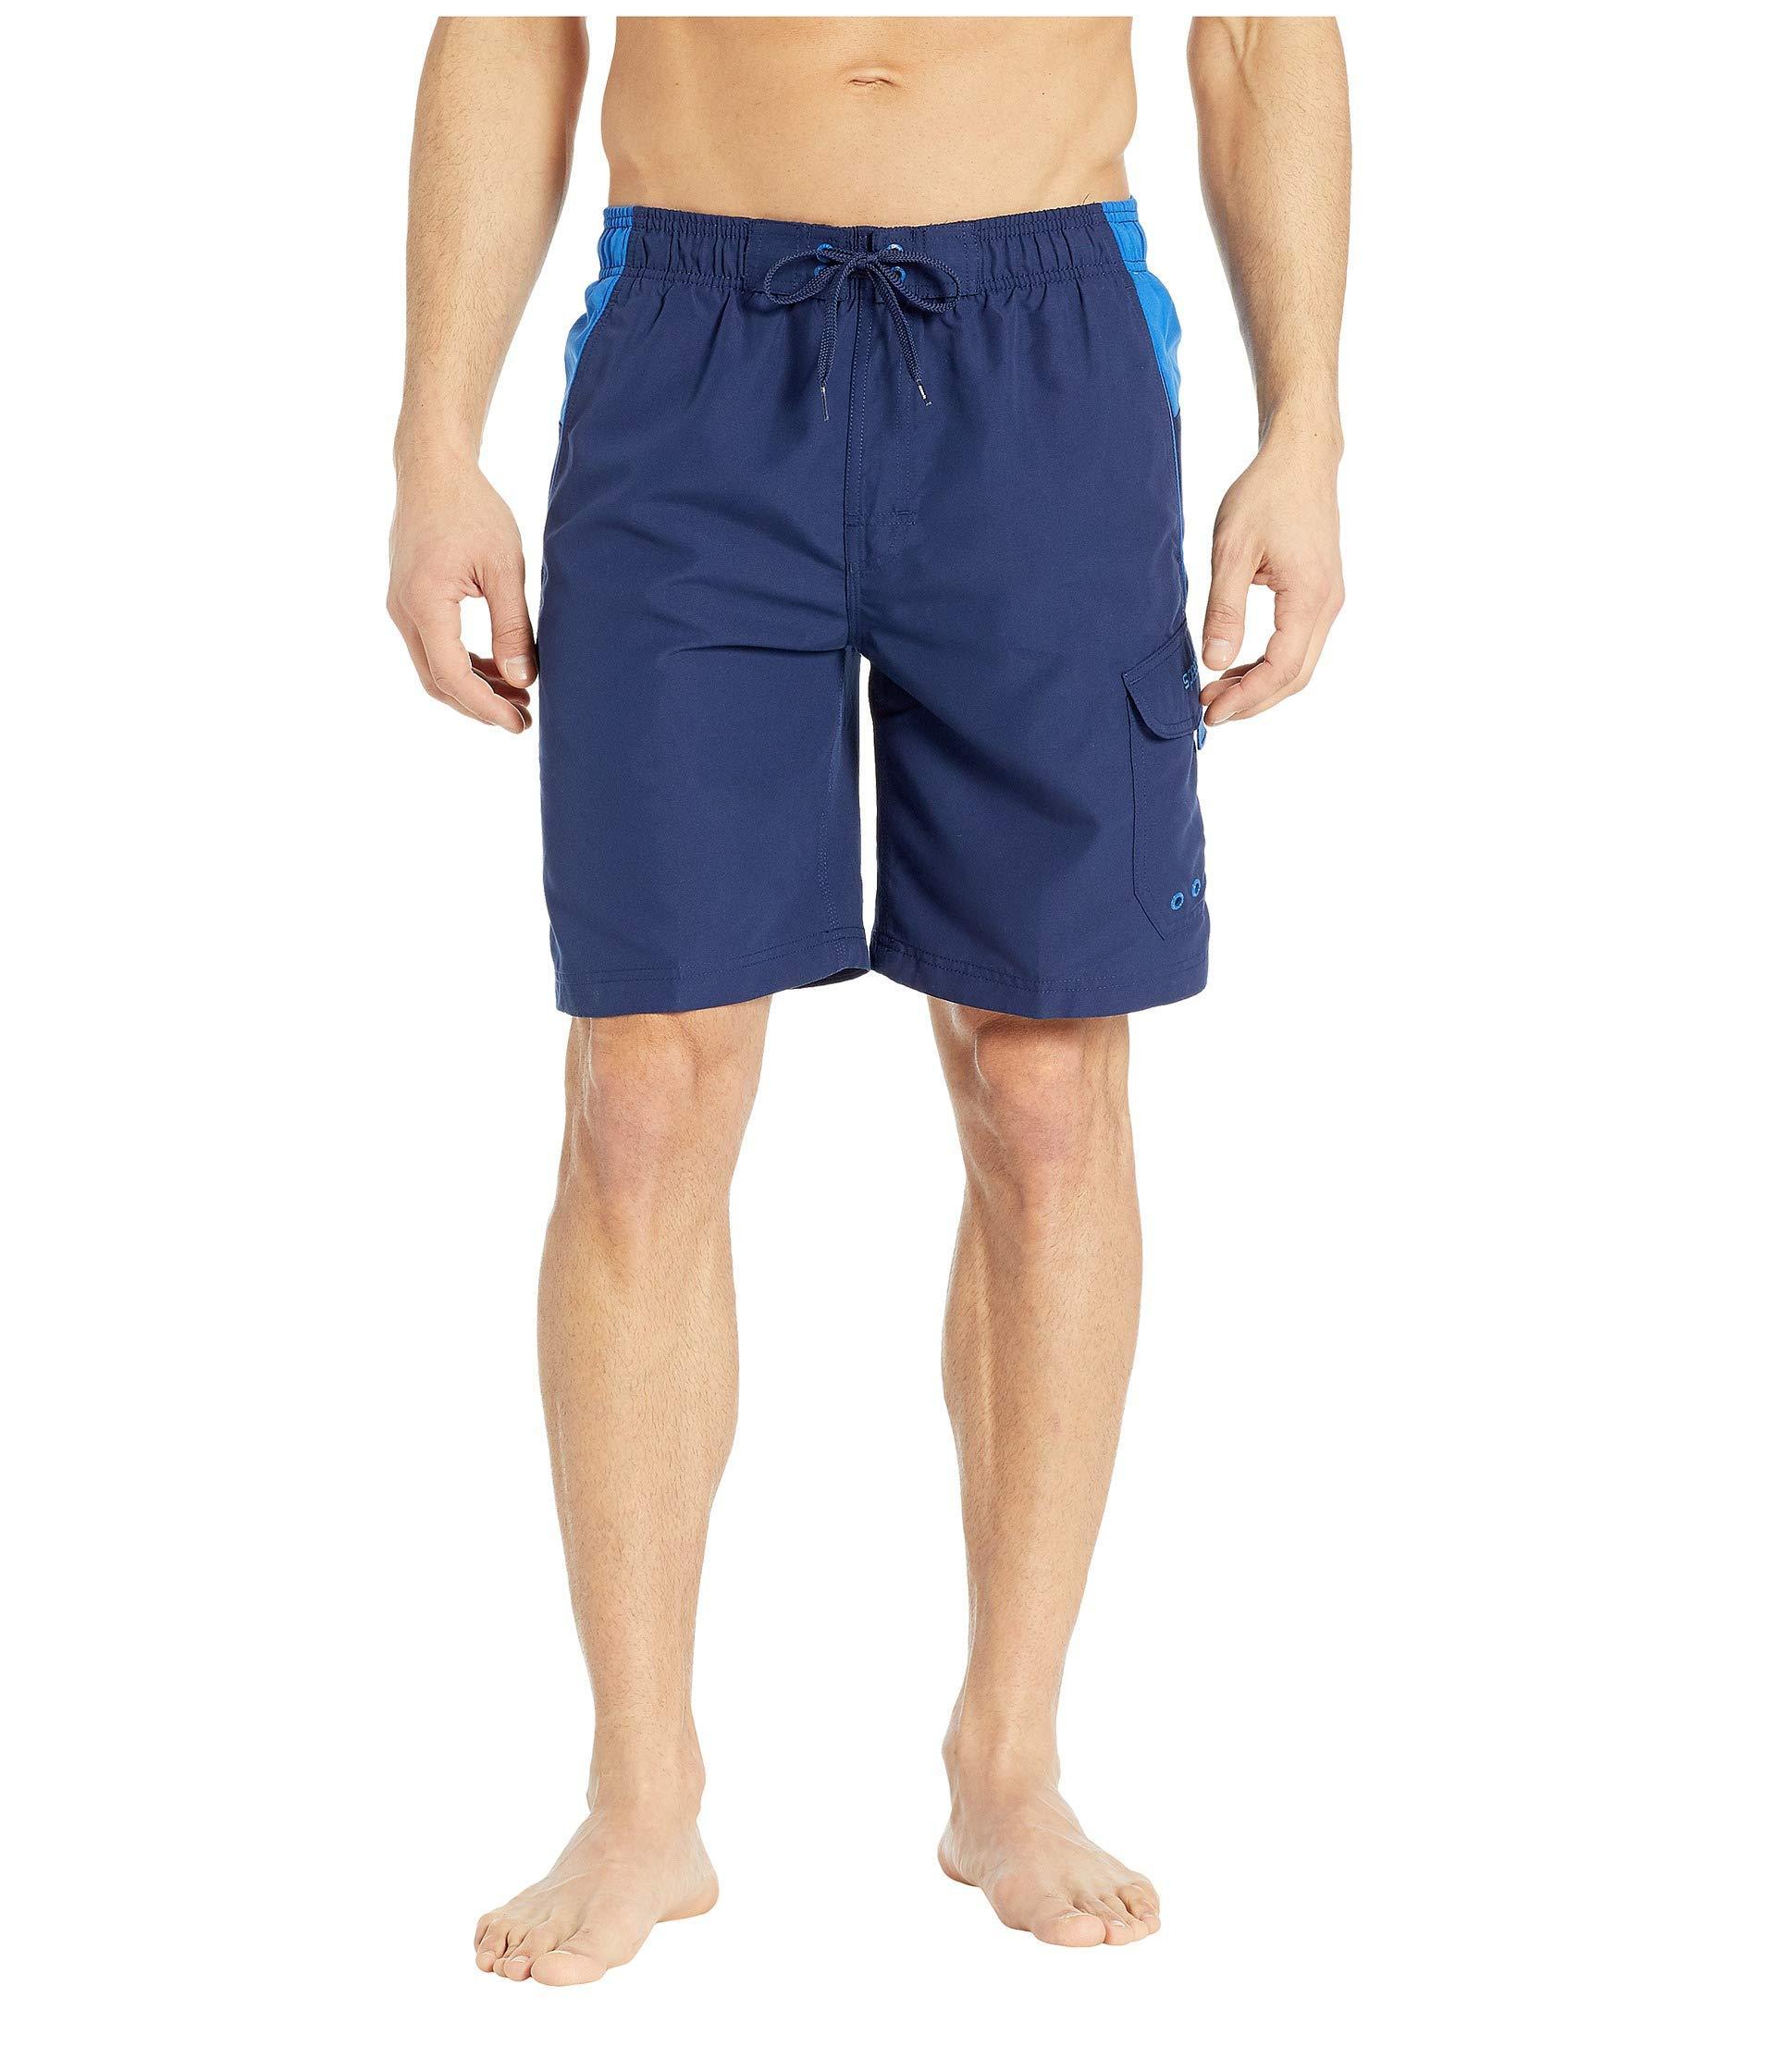 cbfc439d84 Lyst - Speedo Sport Volley ( Navy) Men's Swimwear in Blue for Men